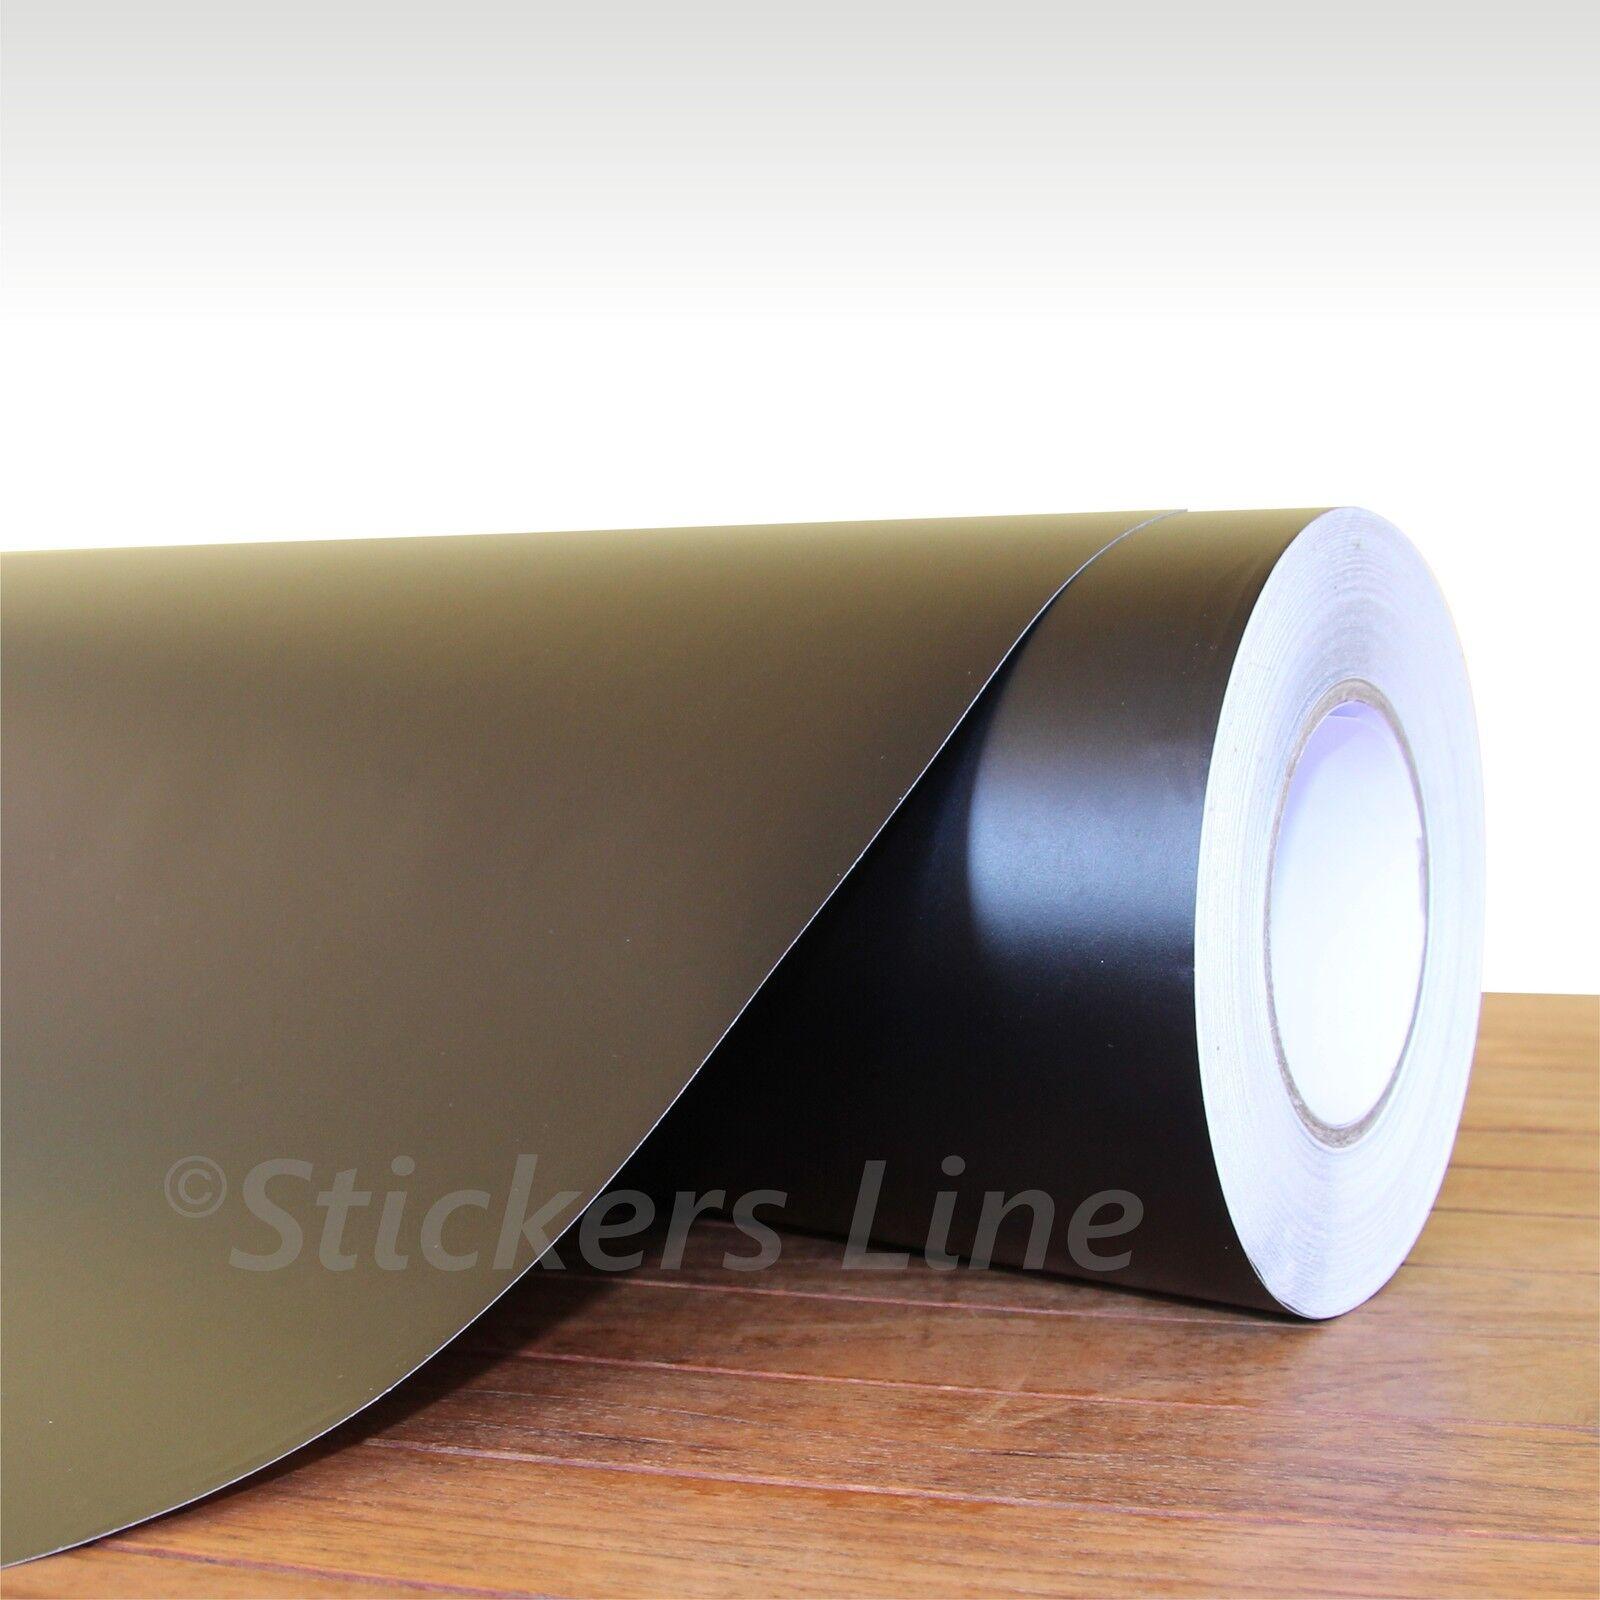 Folie matte schwarz schwarz schwarz cm 150x300 Aufkleber CAST car wrapping Auto Motorrad e69276